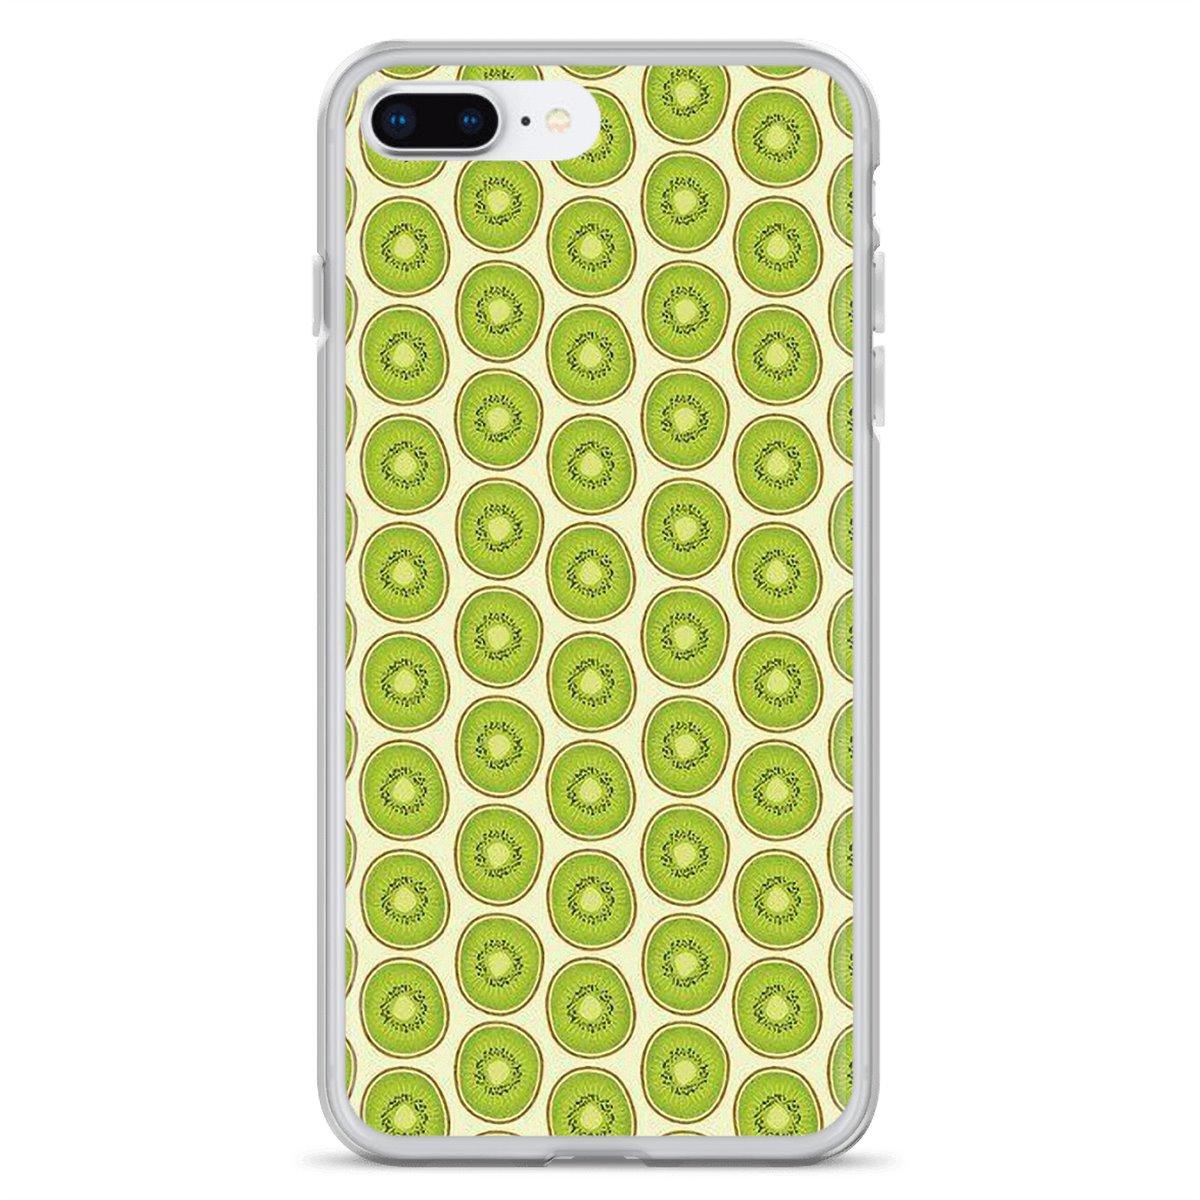 Carcasa de silicona con diseño abstracto verde de Kiwis Fruta de verano para BQ Aquaris C U2 U V X2 X Lite Pro Plus E4.5 M4.5 X5 E5 4G M 2017